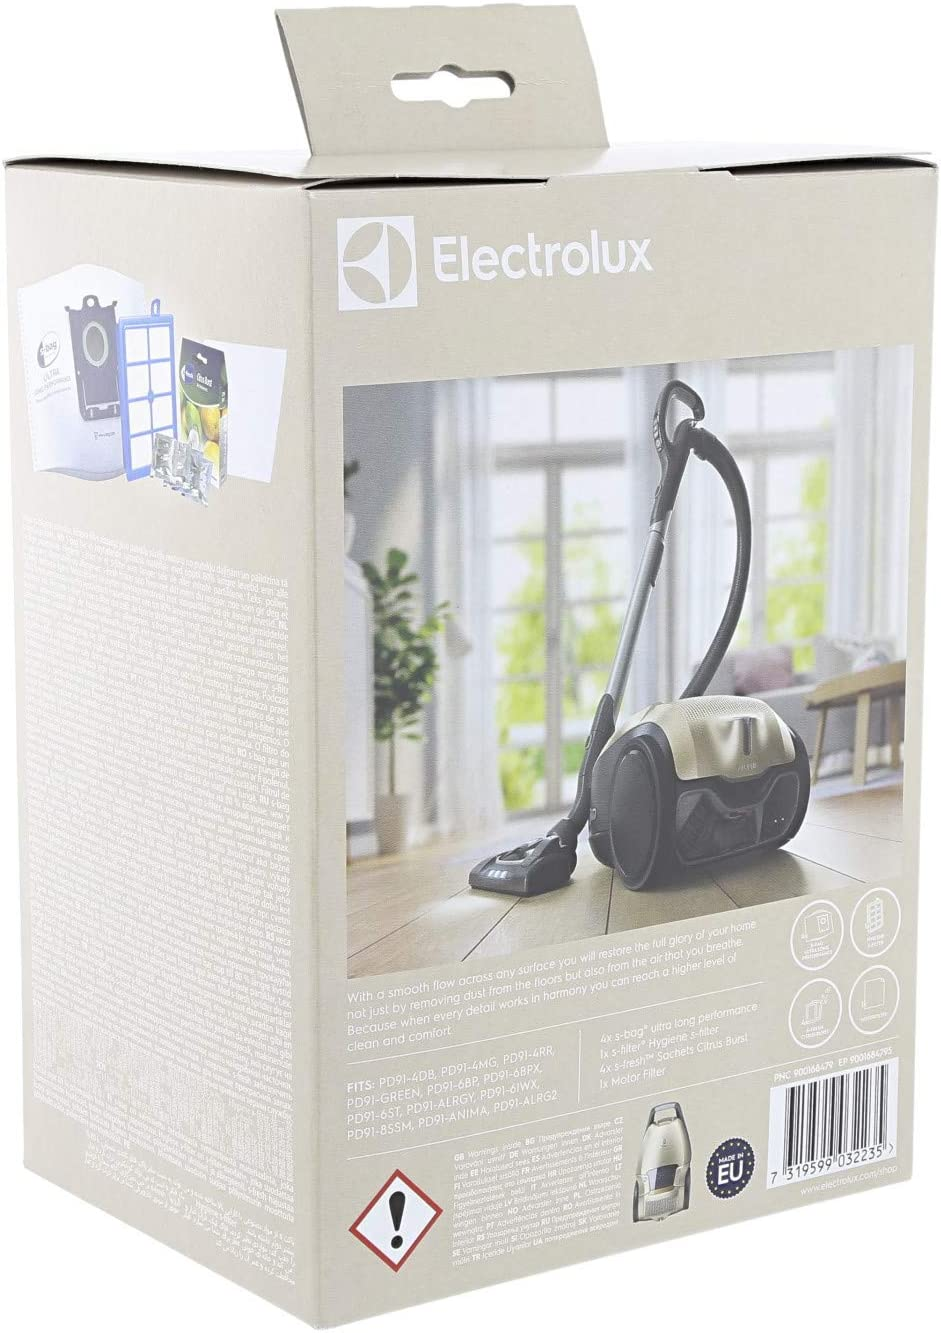 Electrolux ESKD9 Aspiradora cilíndrica Bolsa para el Polvo - Accesorio para aspiradora (Aspiradora cilíndrica, Bolsa para el Polvo, Multicolor): Amazon.es: Hogar